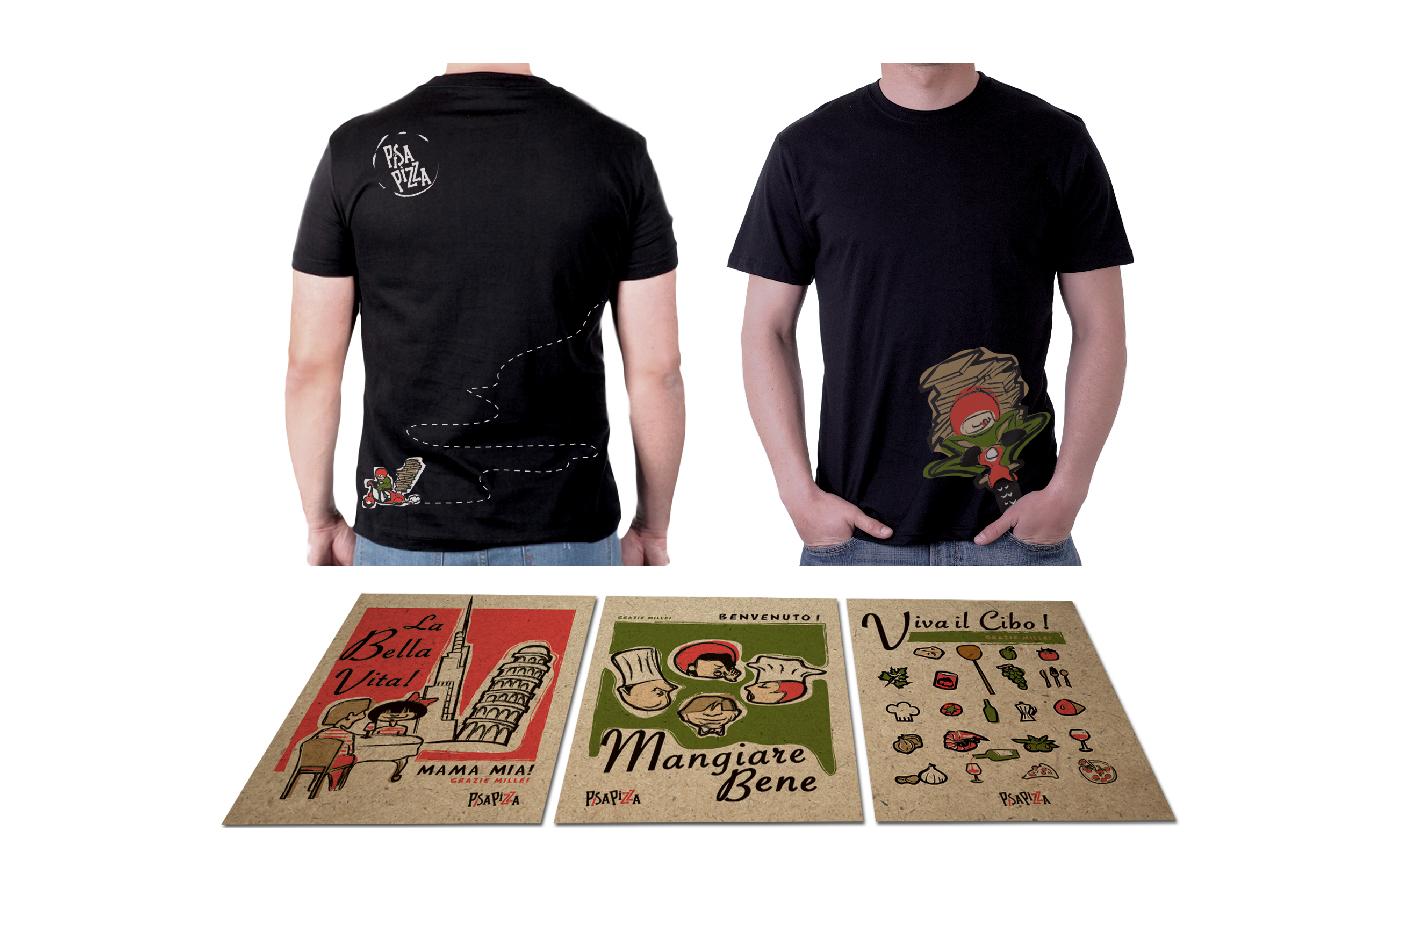 12-pisa-pizza_restaurant-t-shirt_posters.jpg